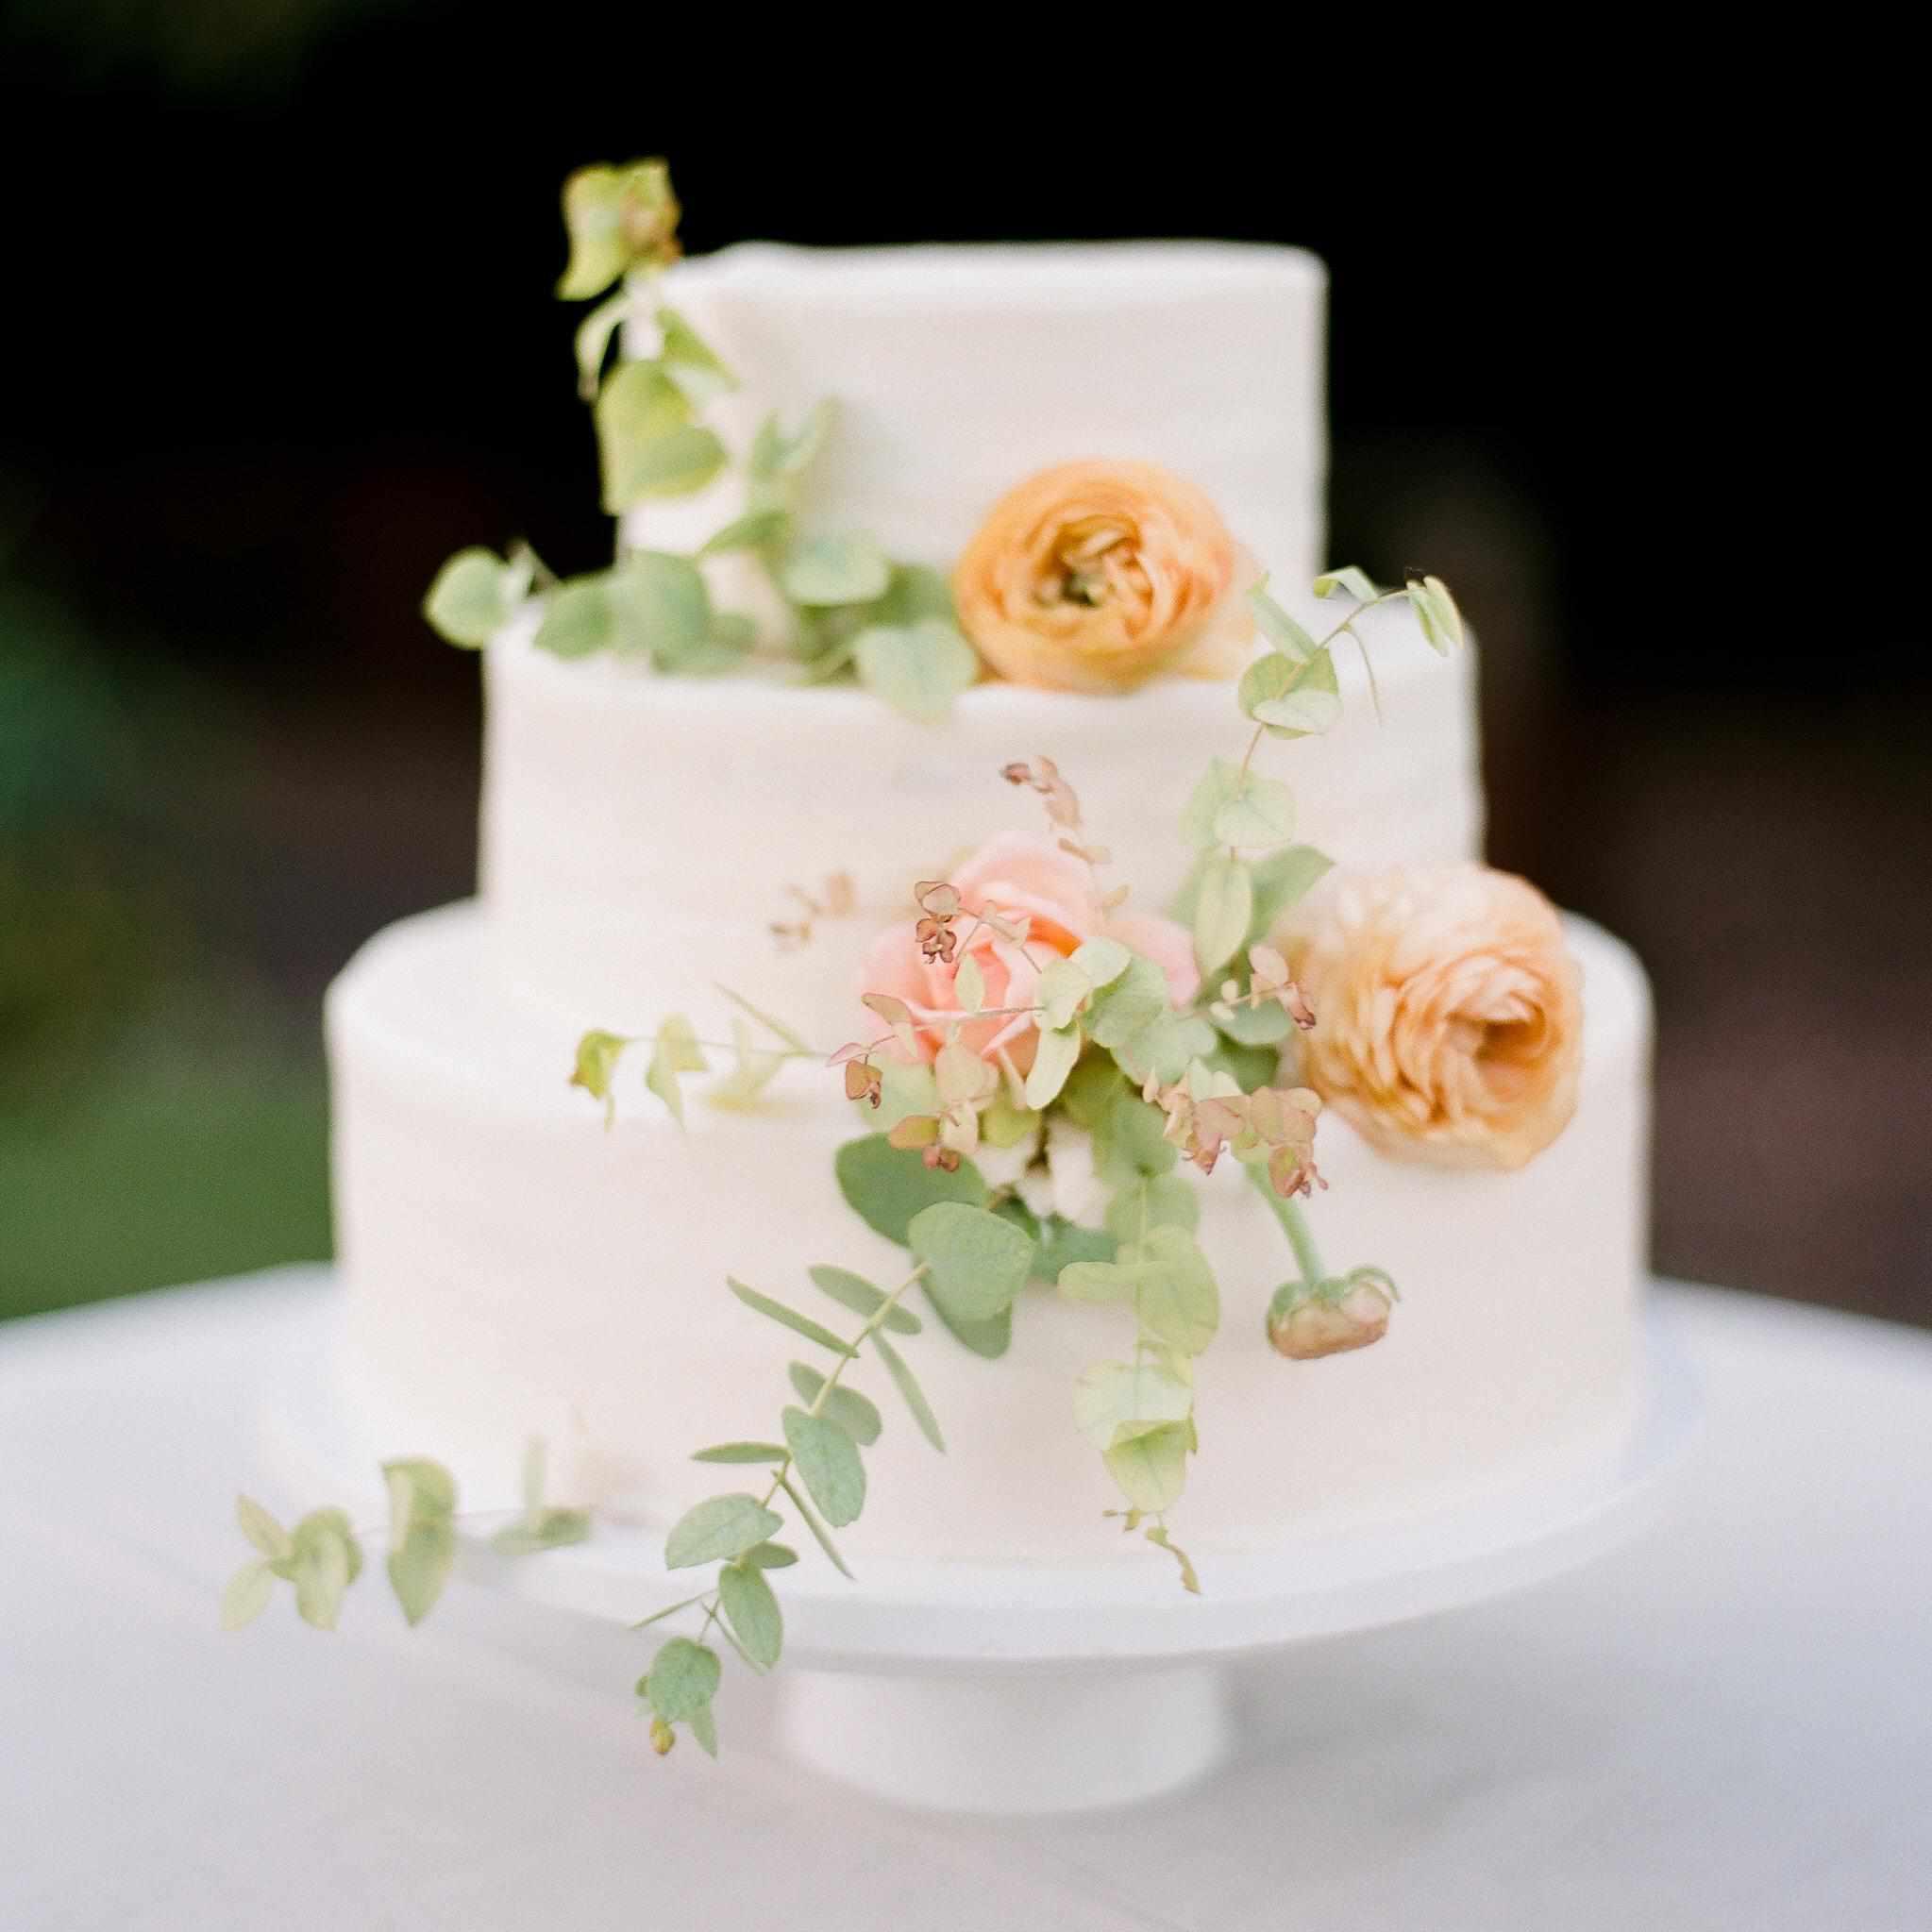 Simple White Wedding Theme: 32 Wedding Cakes We Love For Summer Weddings